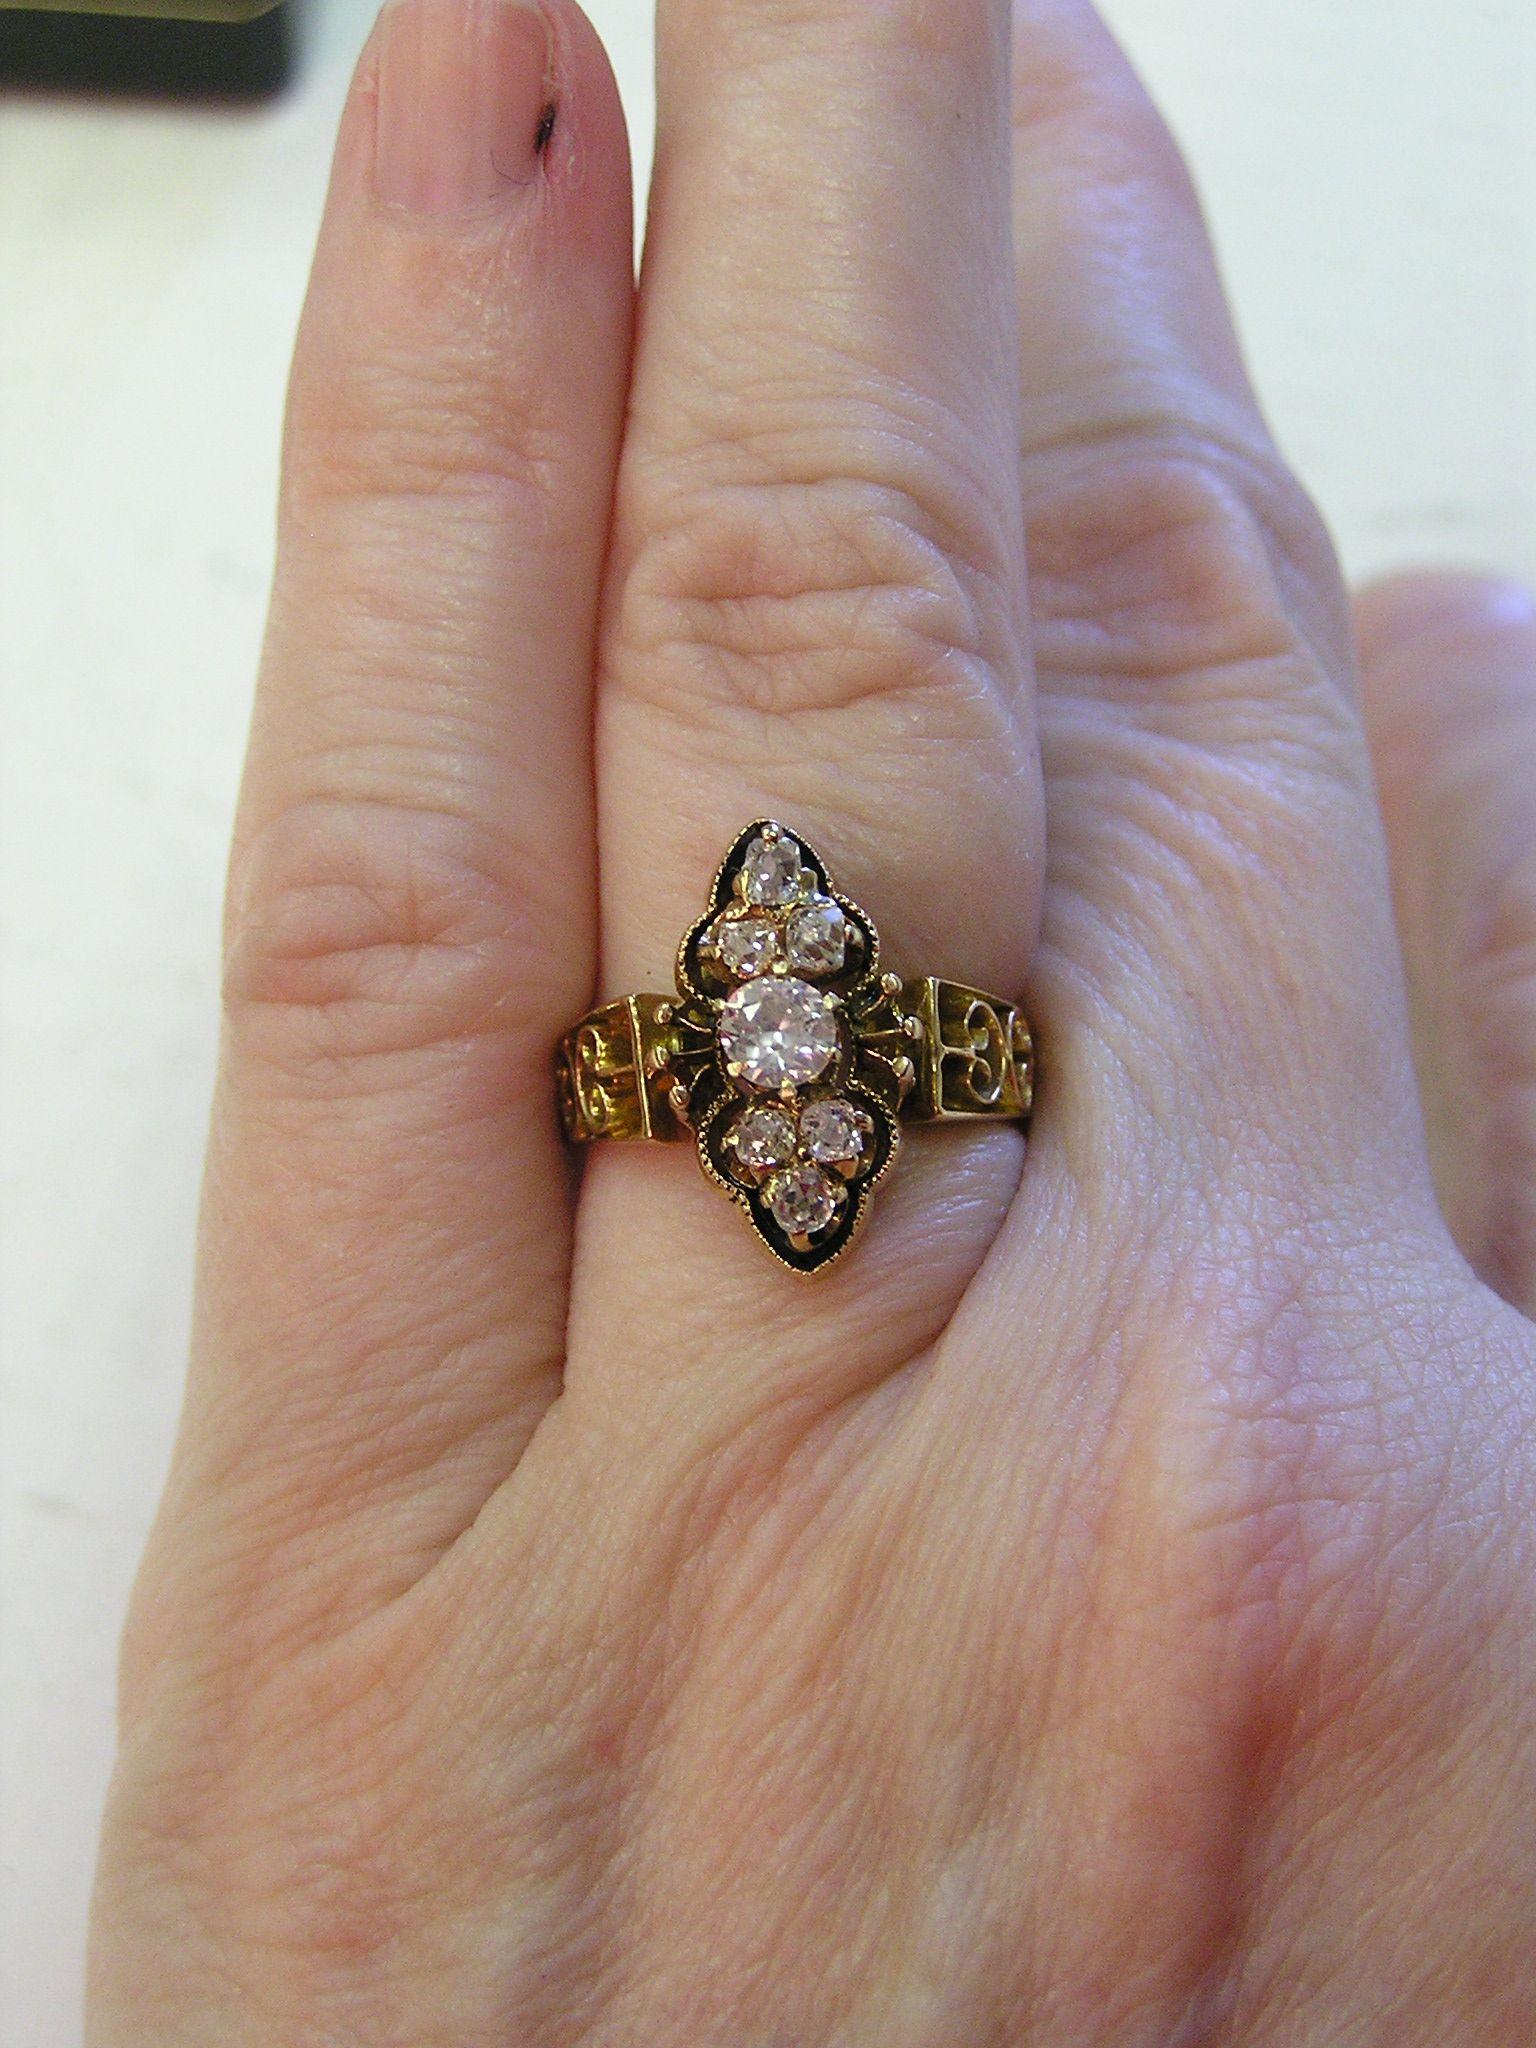 Civil war era engagement ring Jewelry Pinterest Ring Pearl